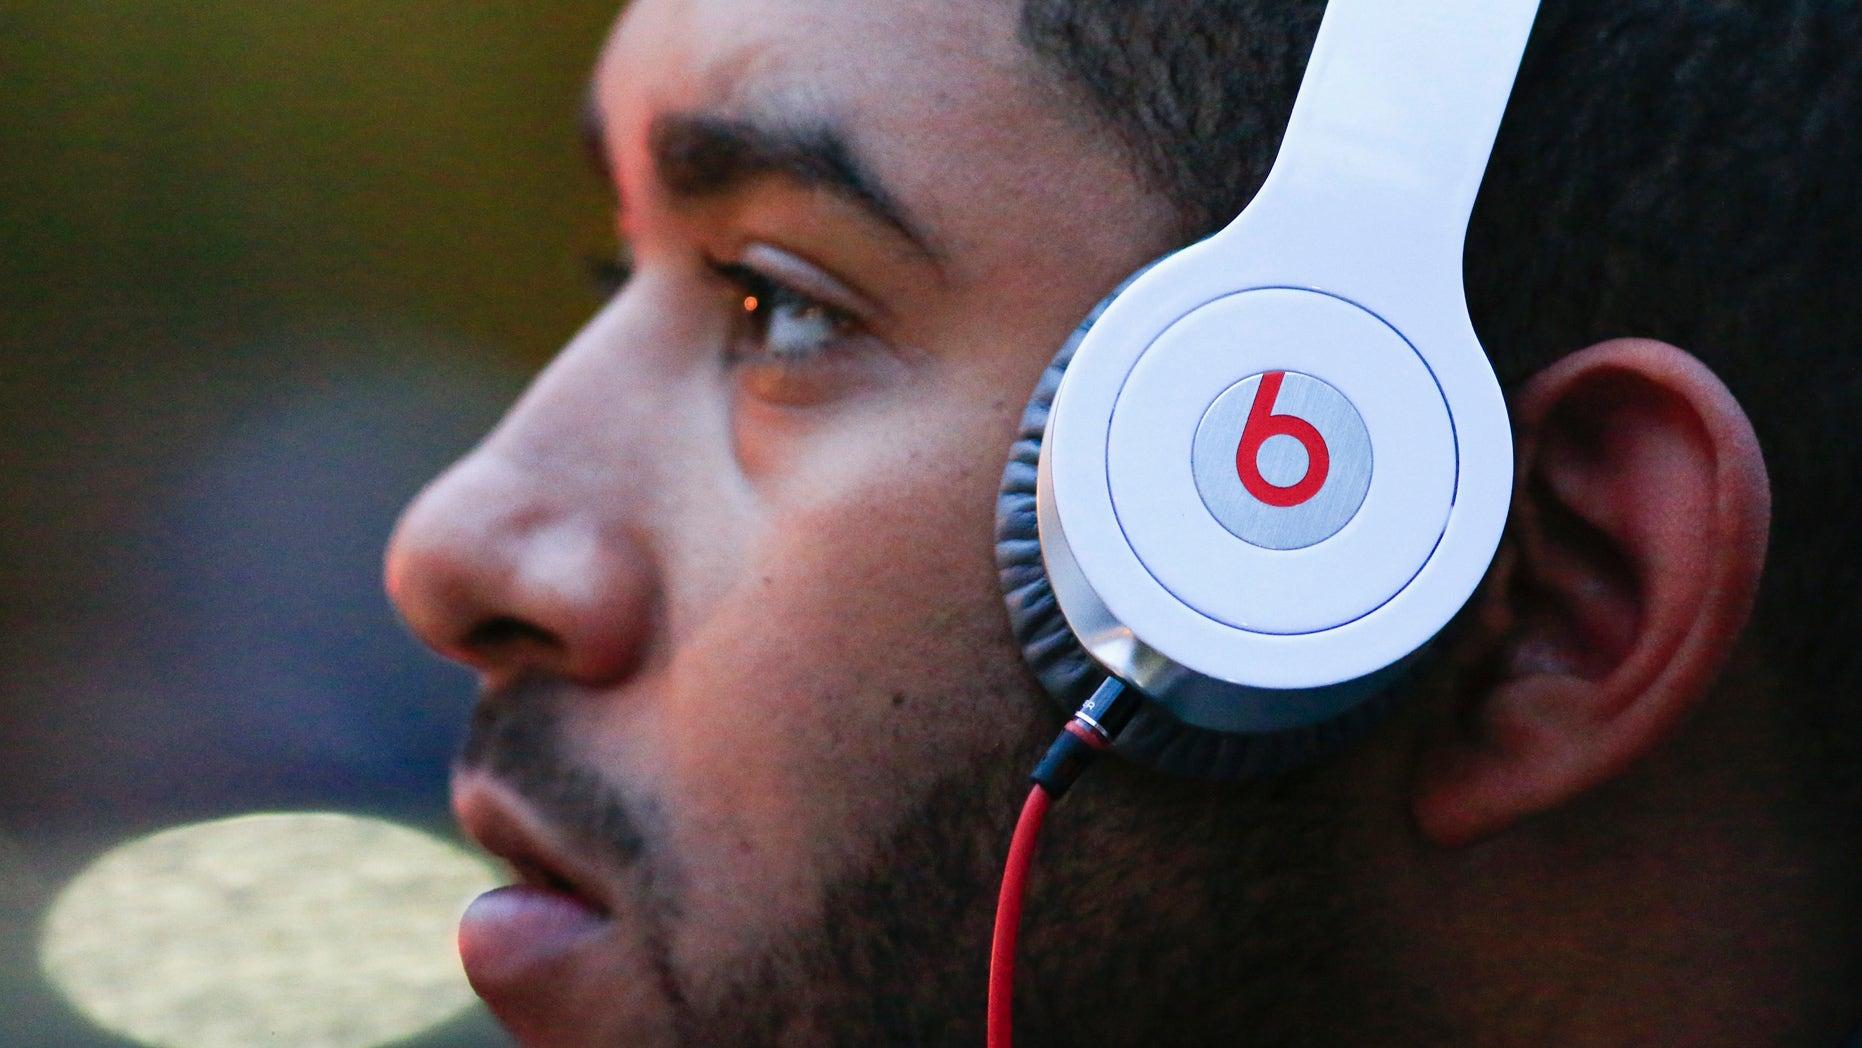 A man listens to Beats brand headphones on a street in New York, May 29, 2014. (REUTERS/Eduardo Munoz)